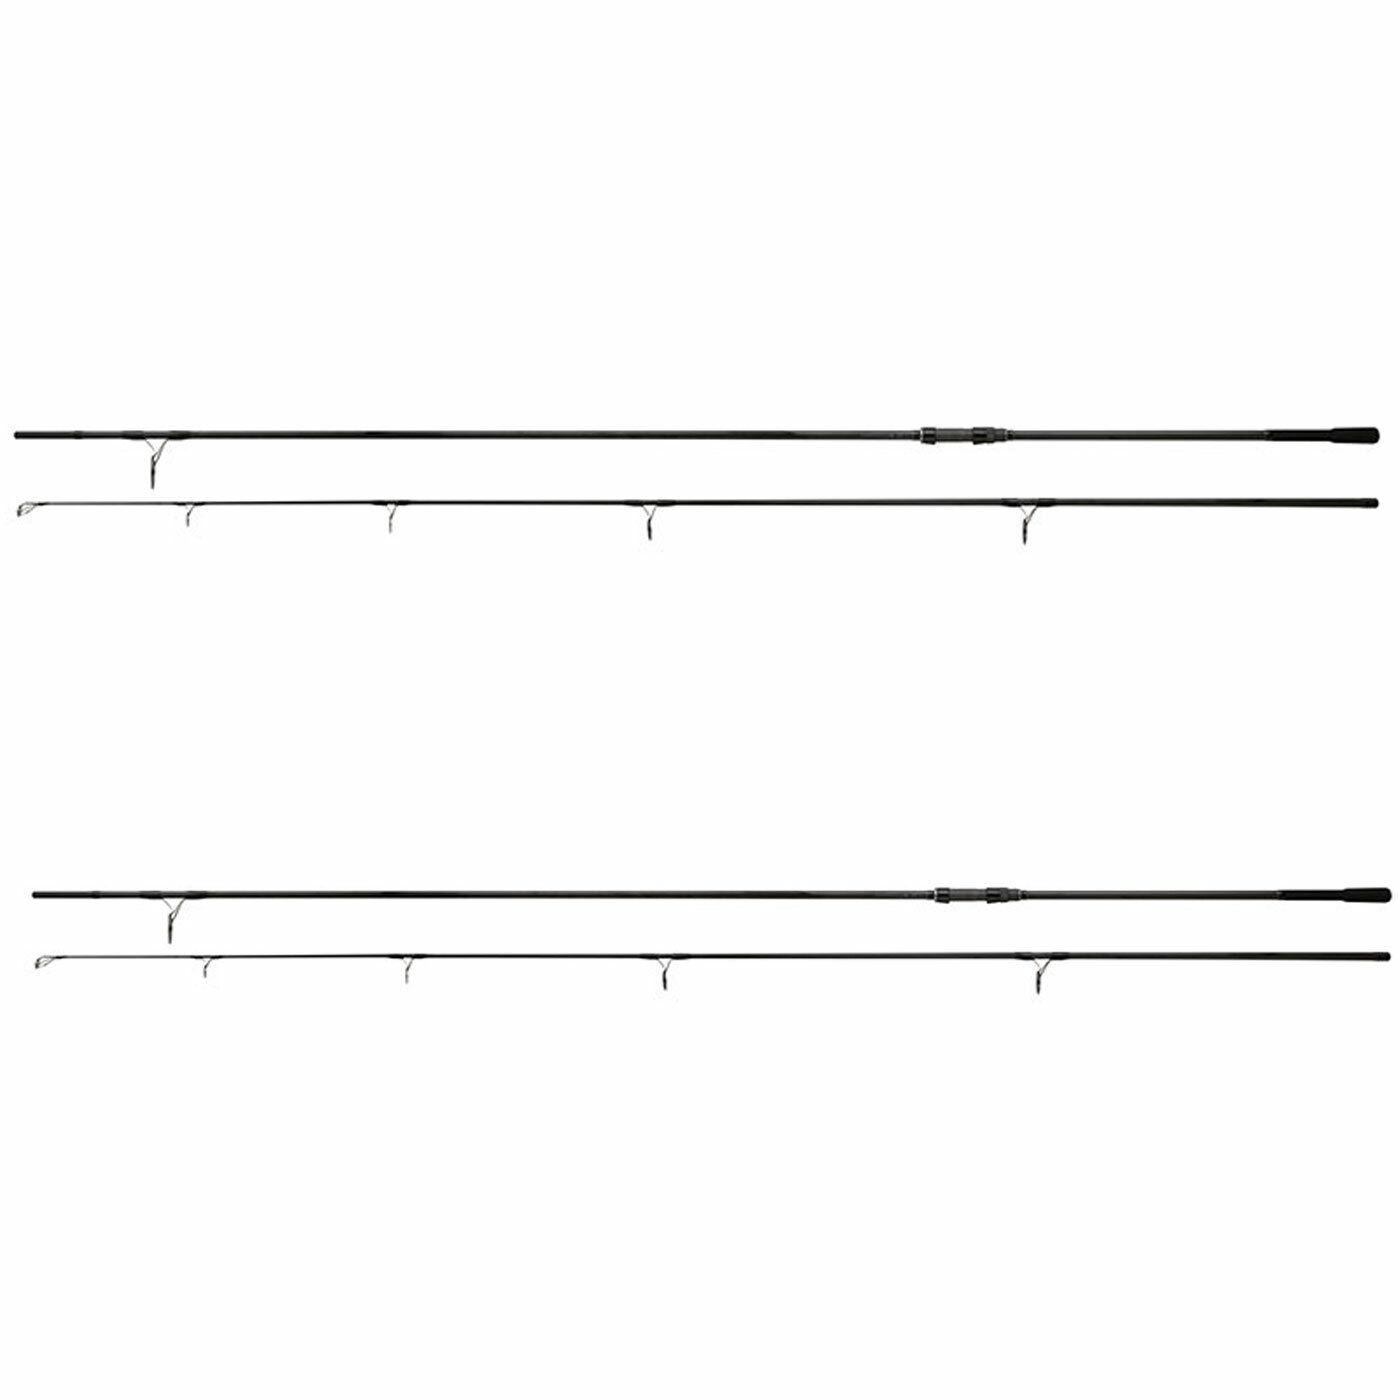 Fox Horizon X4 12ft Cork Rods 3.5lb BRAND NEW SAME DAY DISPATCH